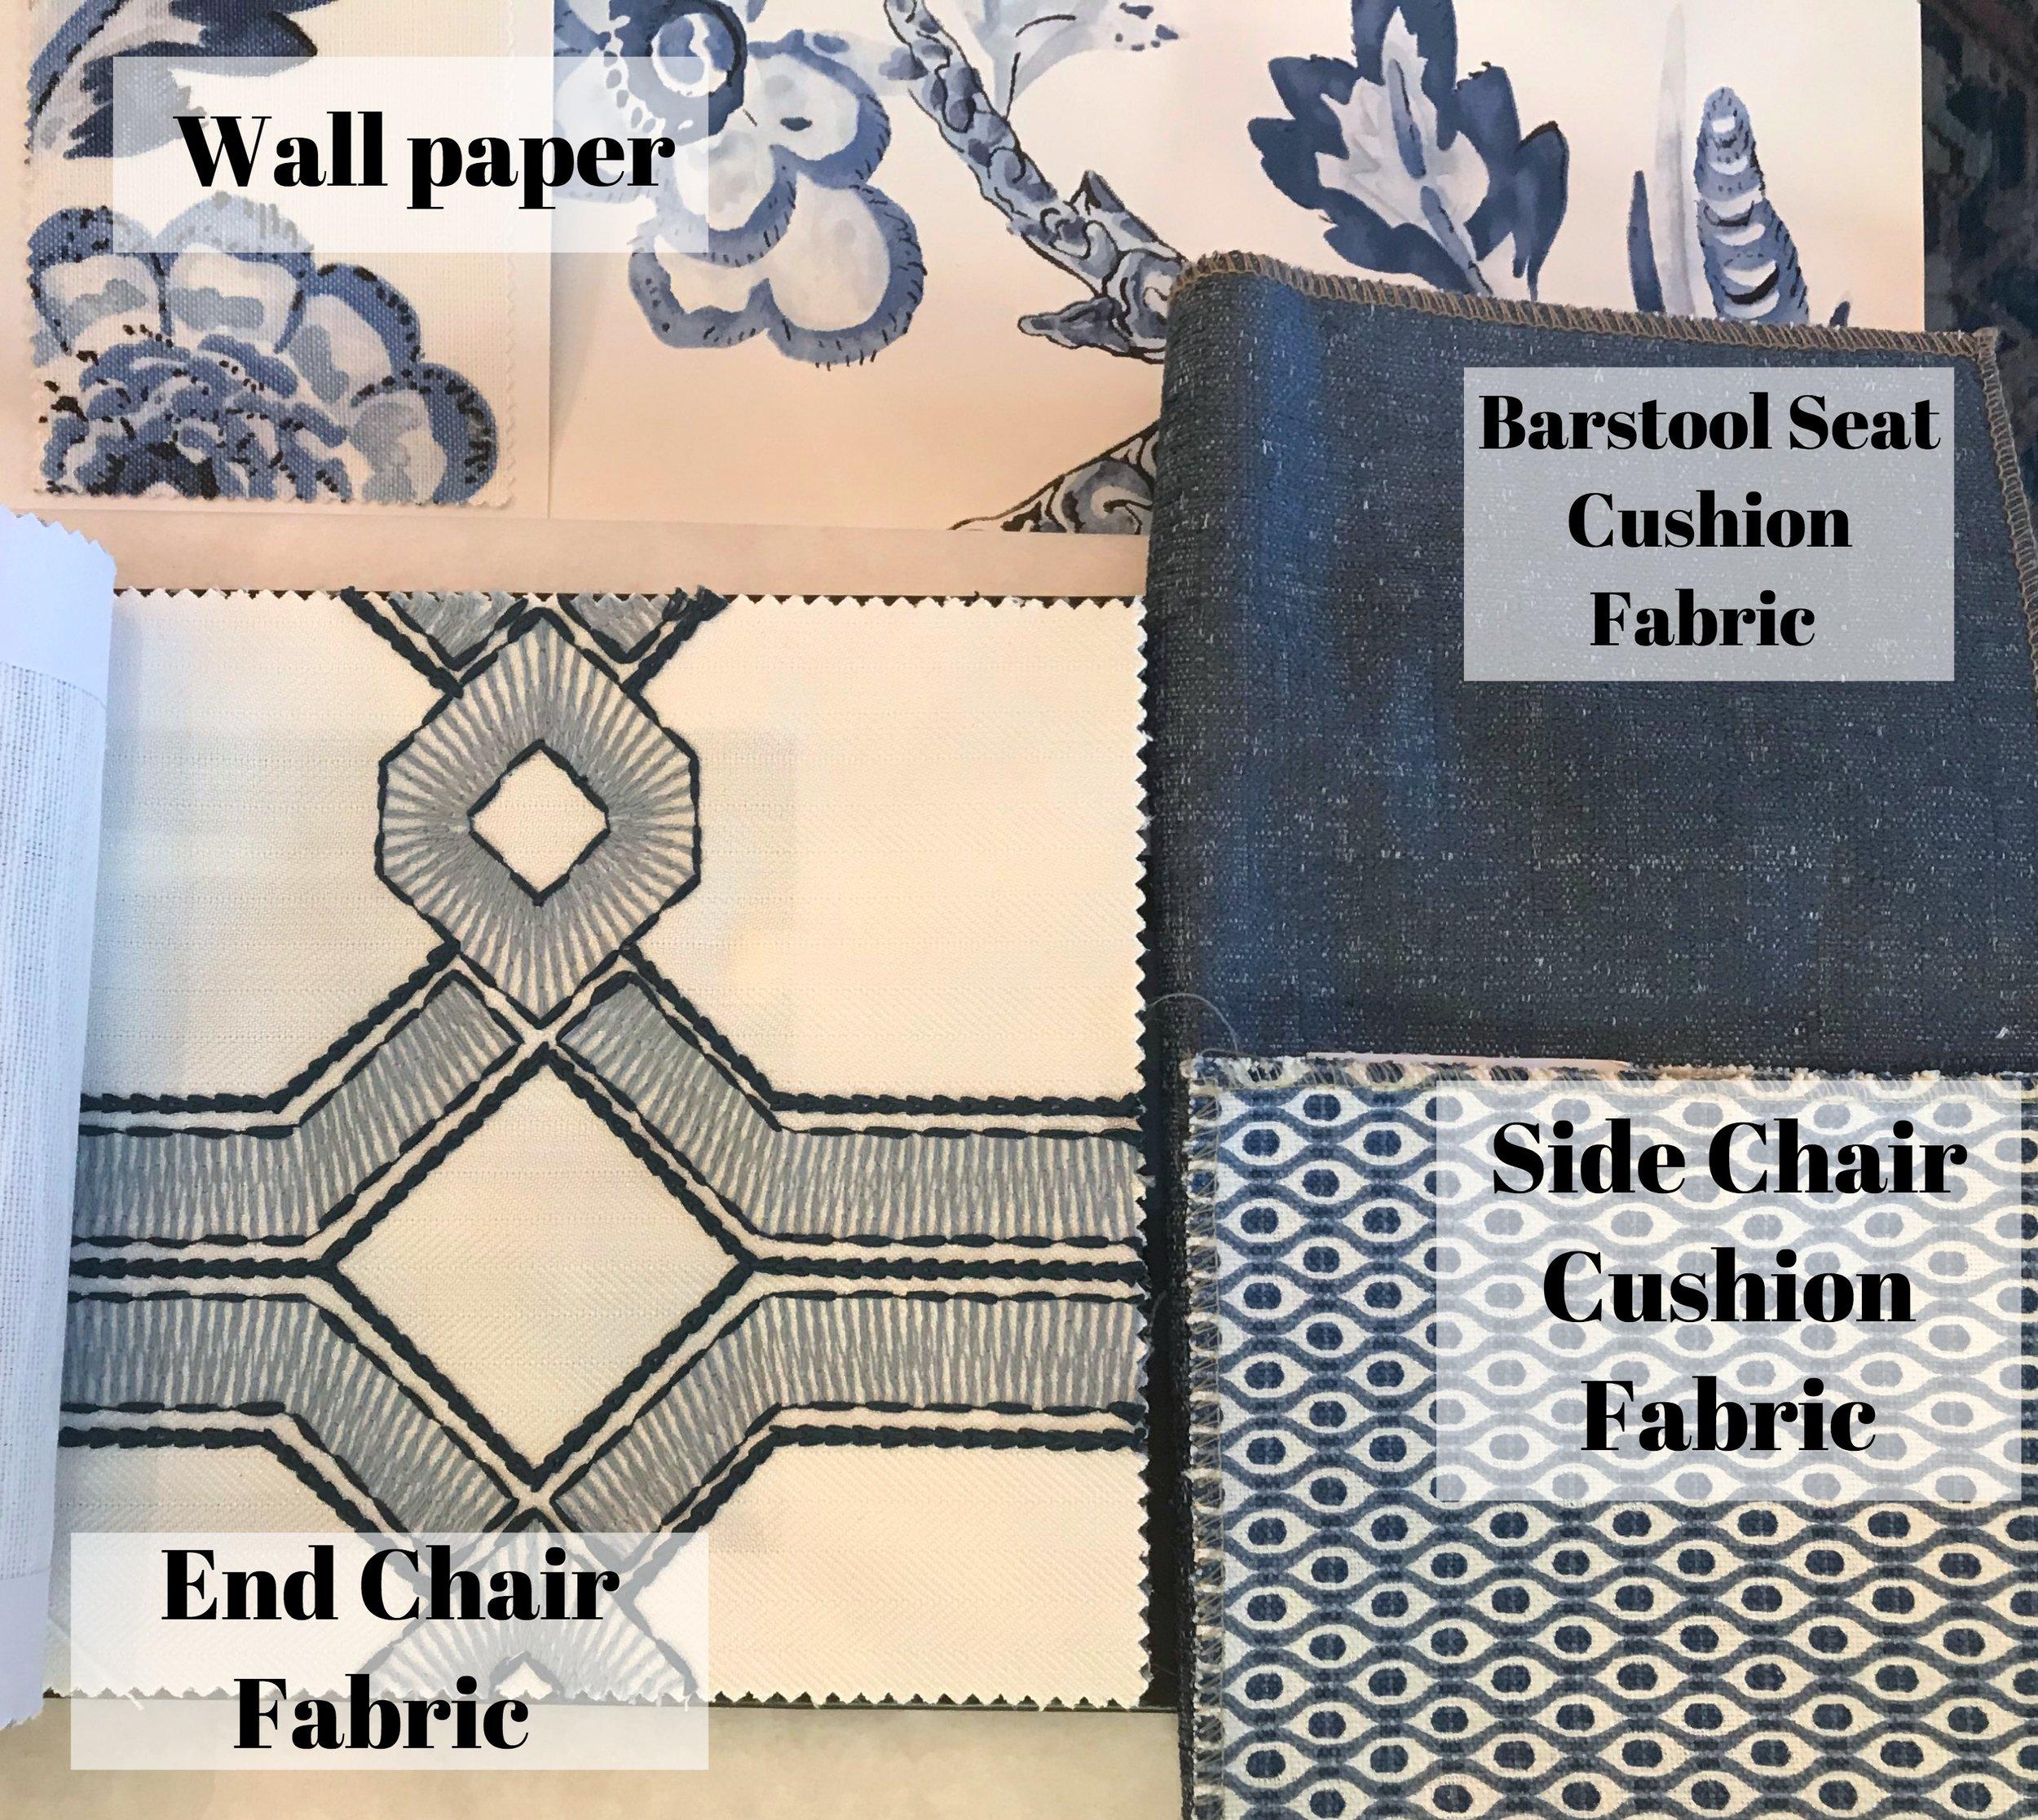 Fabric image.jpg